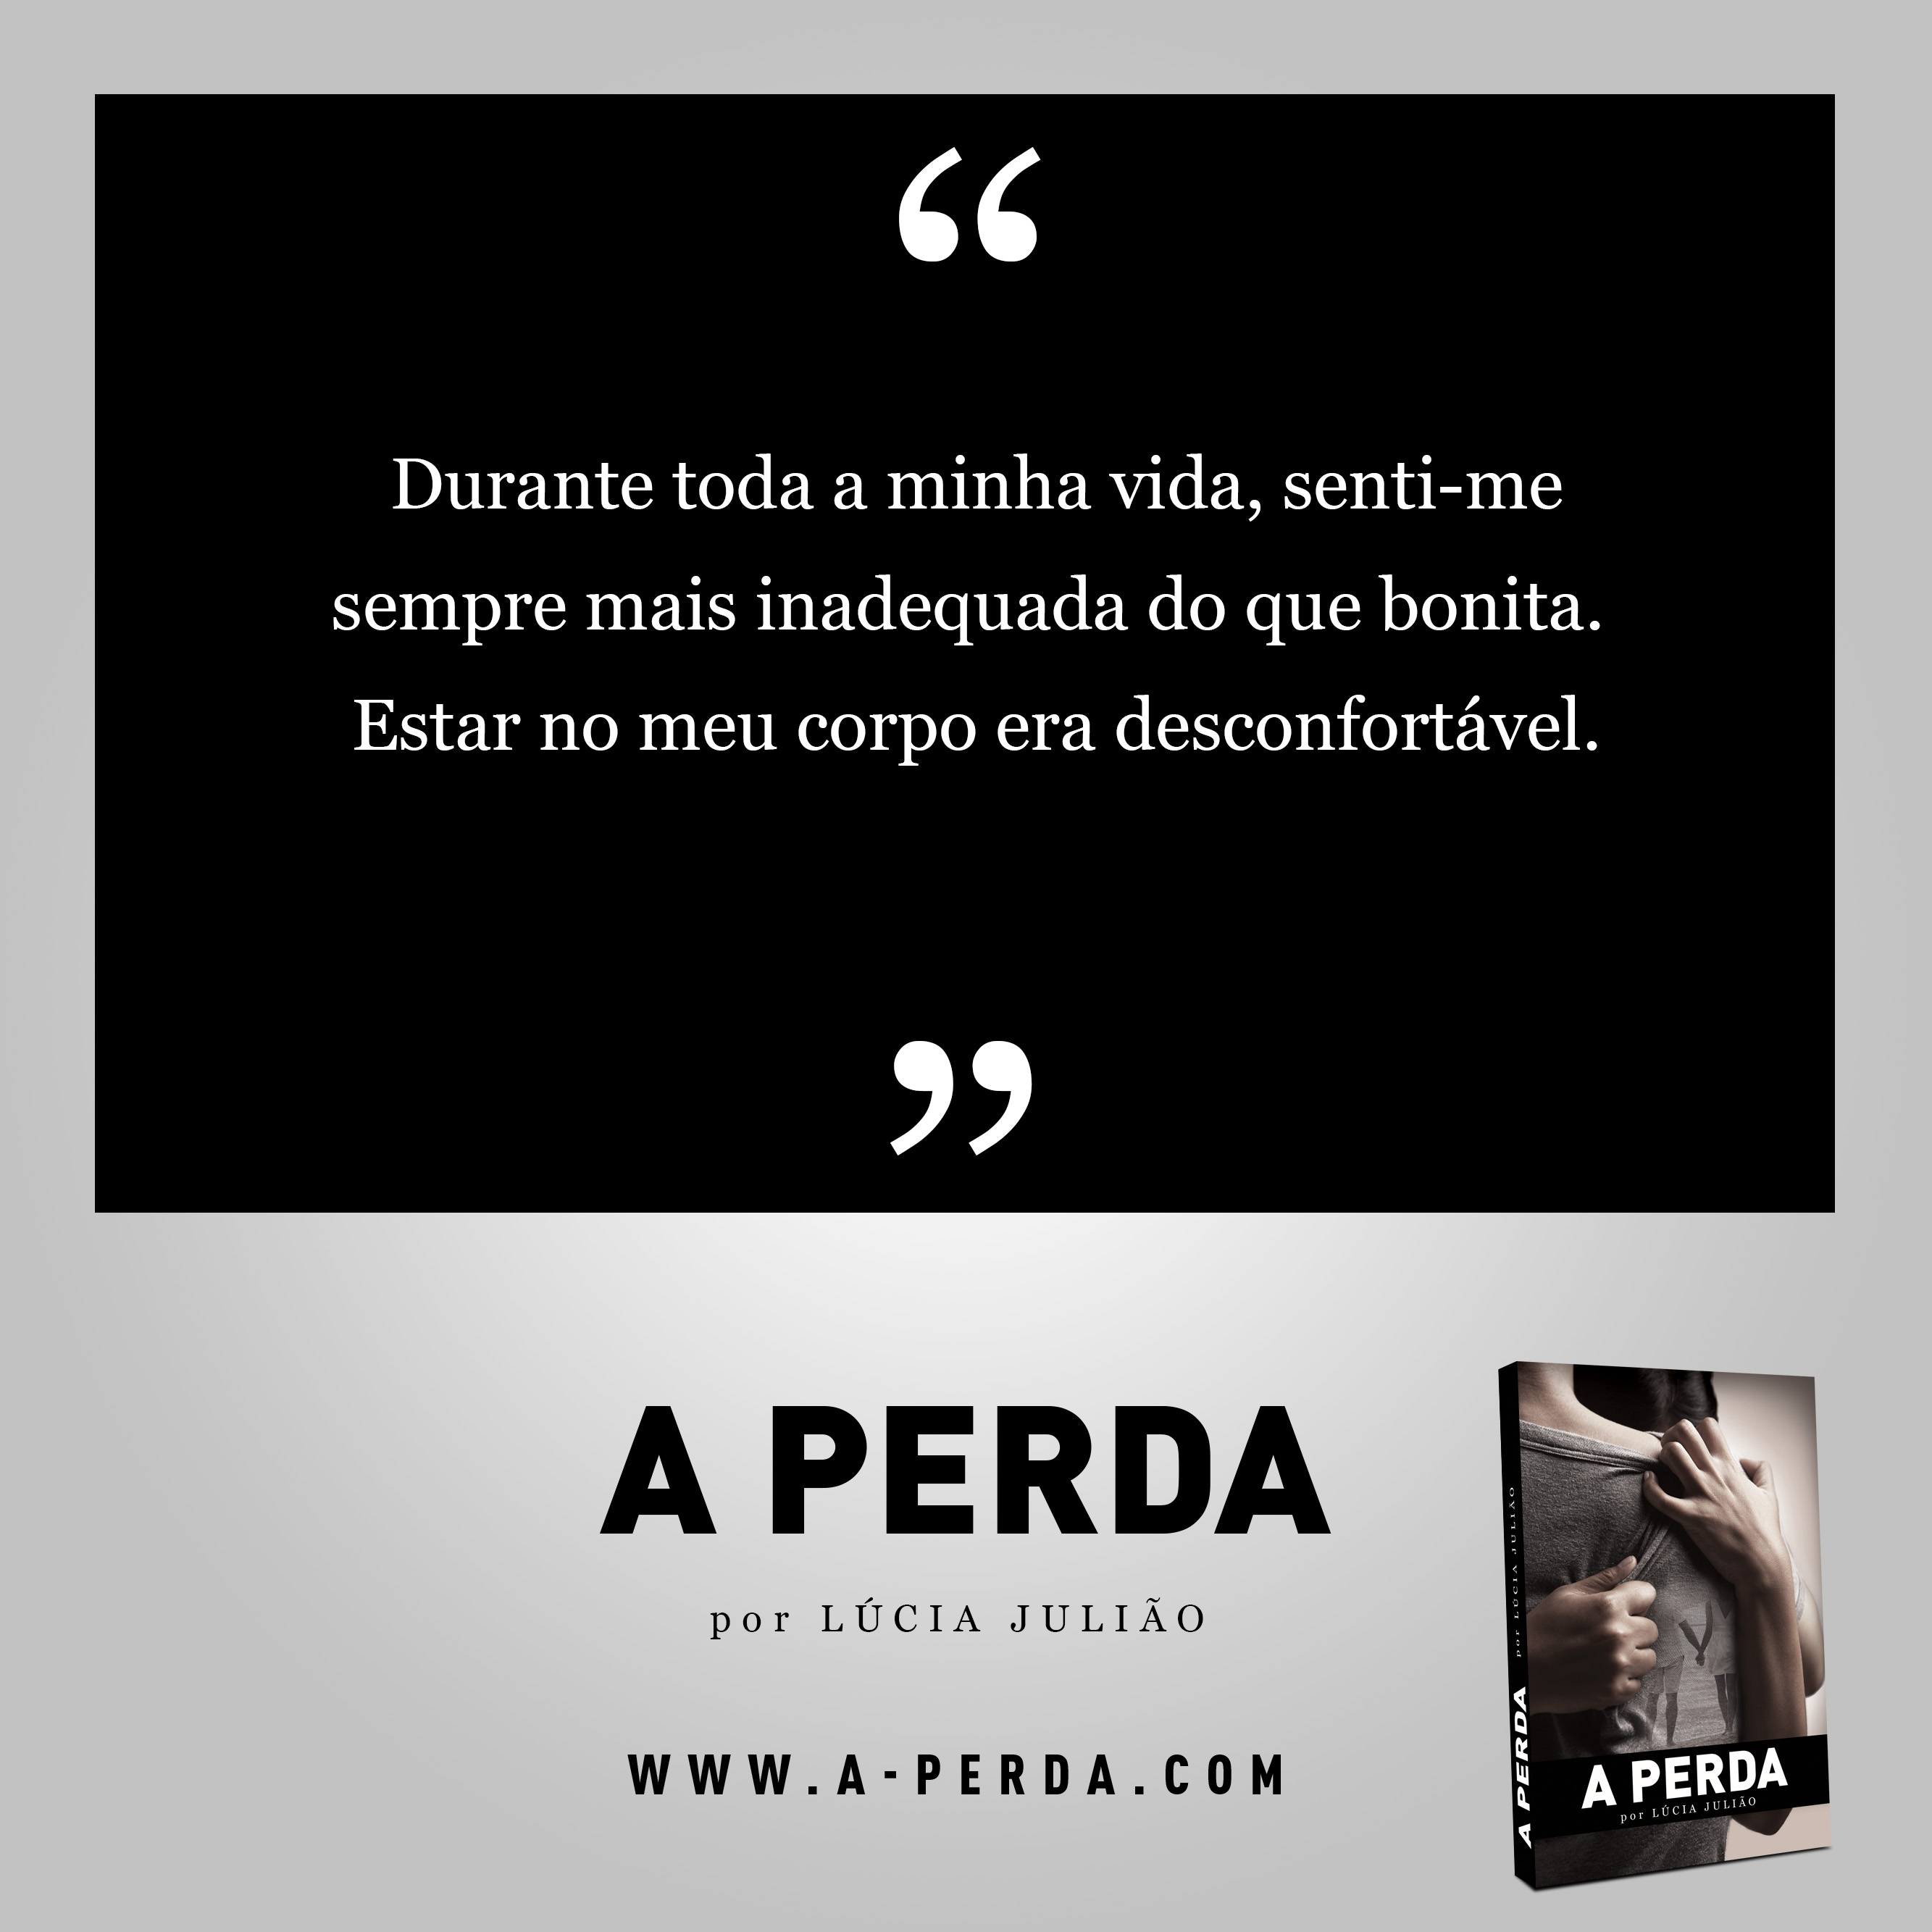 006-capitulo-10-livro-a-Perda-de-Lucia-Juliao-instagram